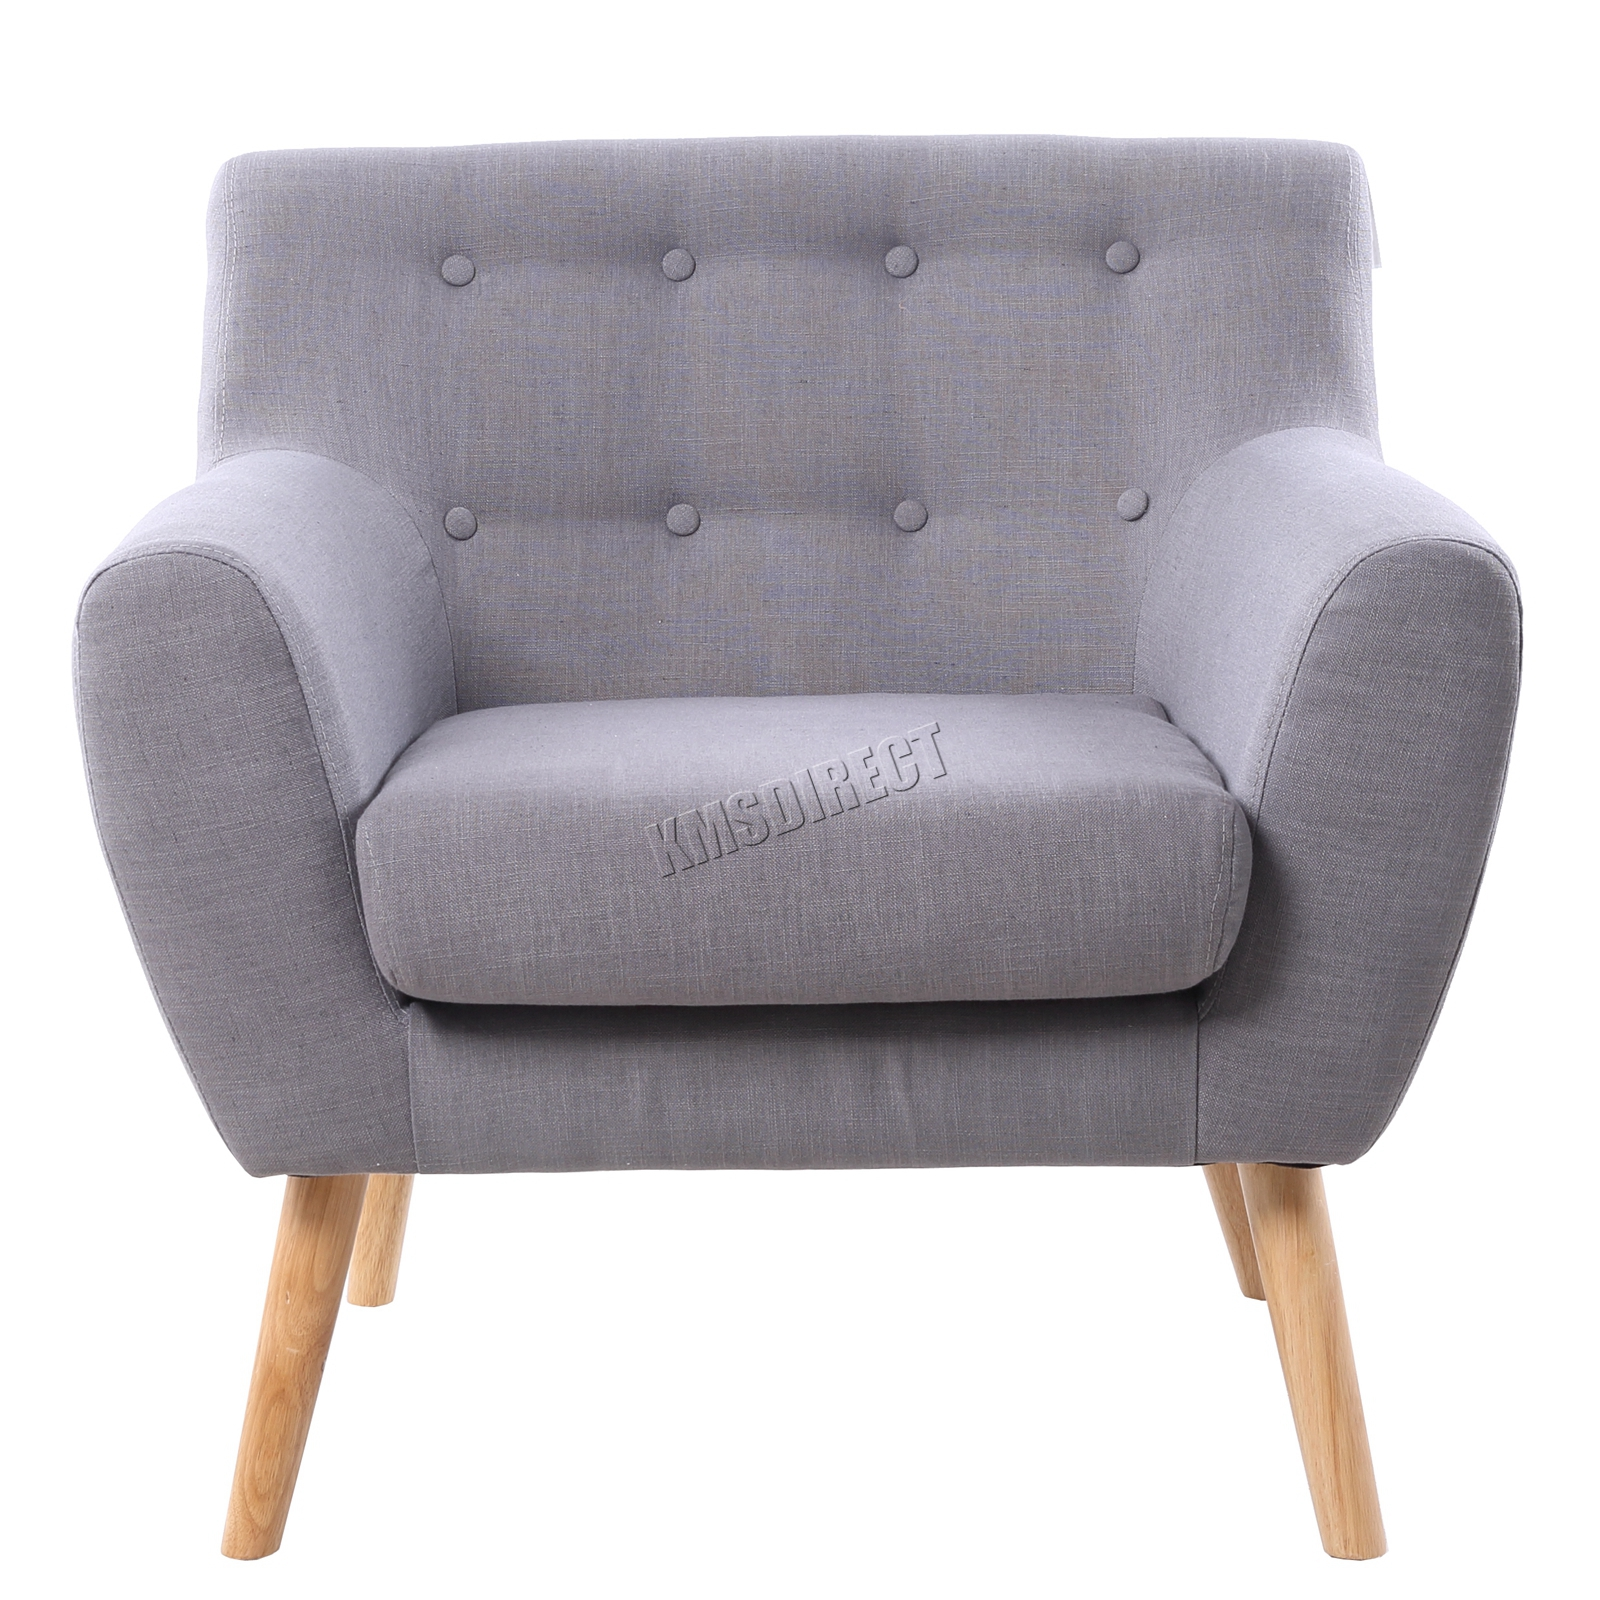 FoxHunter Linen Fabric 1 Single Seat Sofa Tub Arm Chair